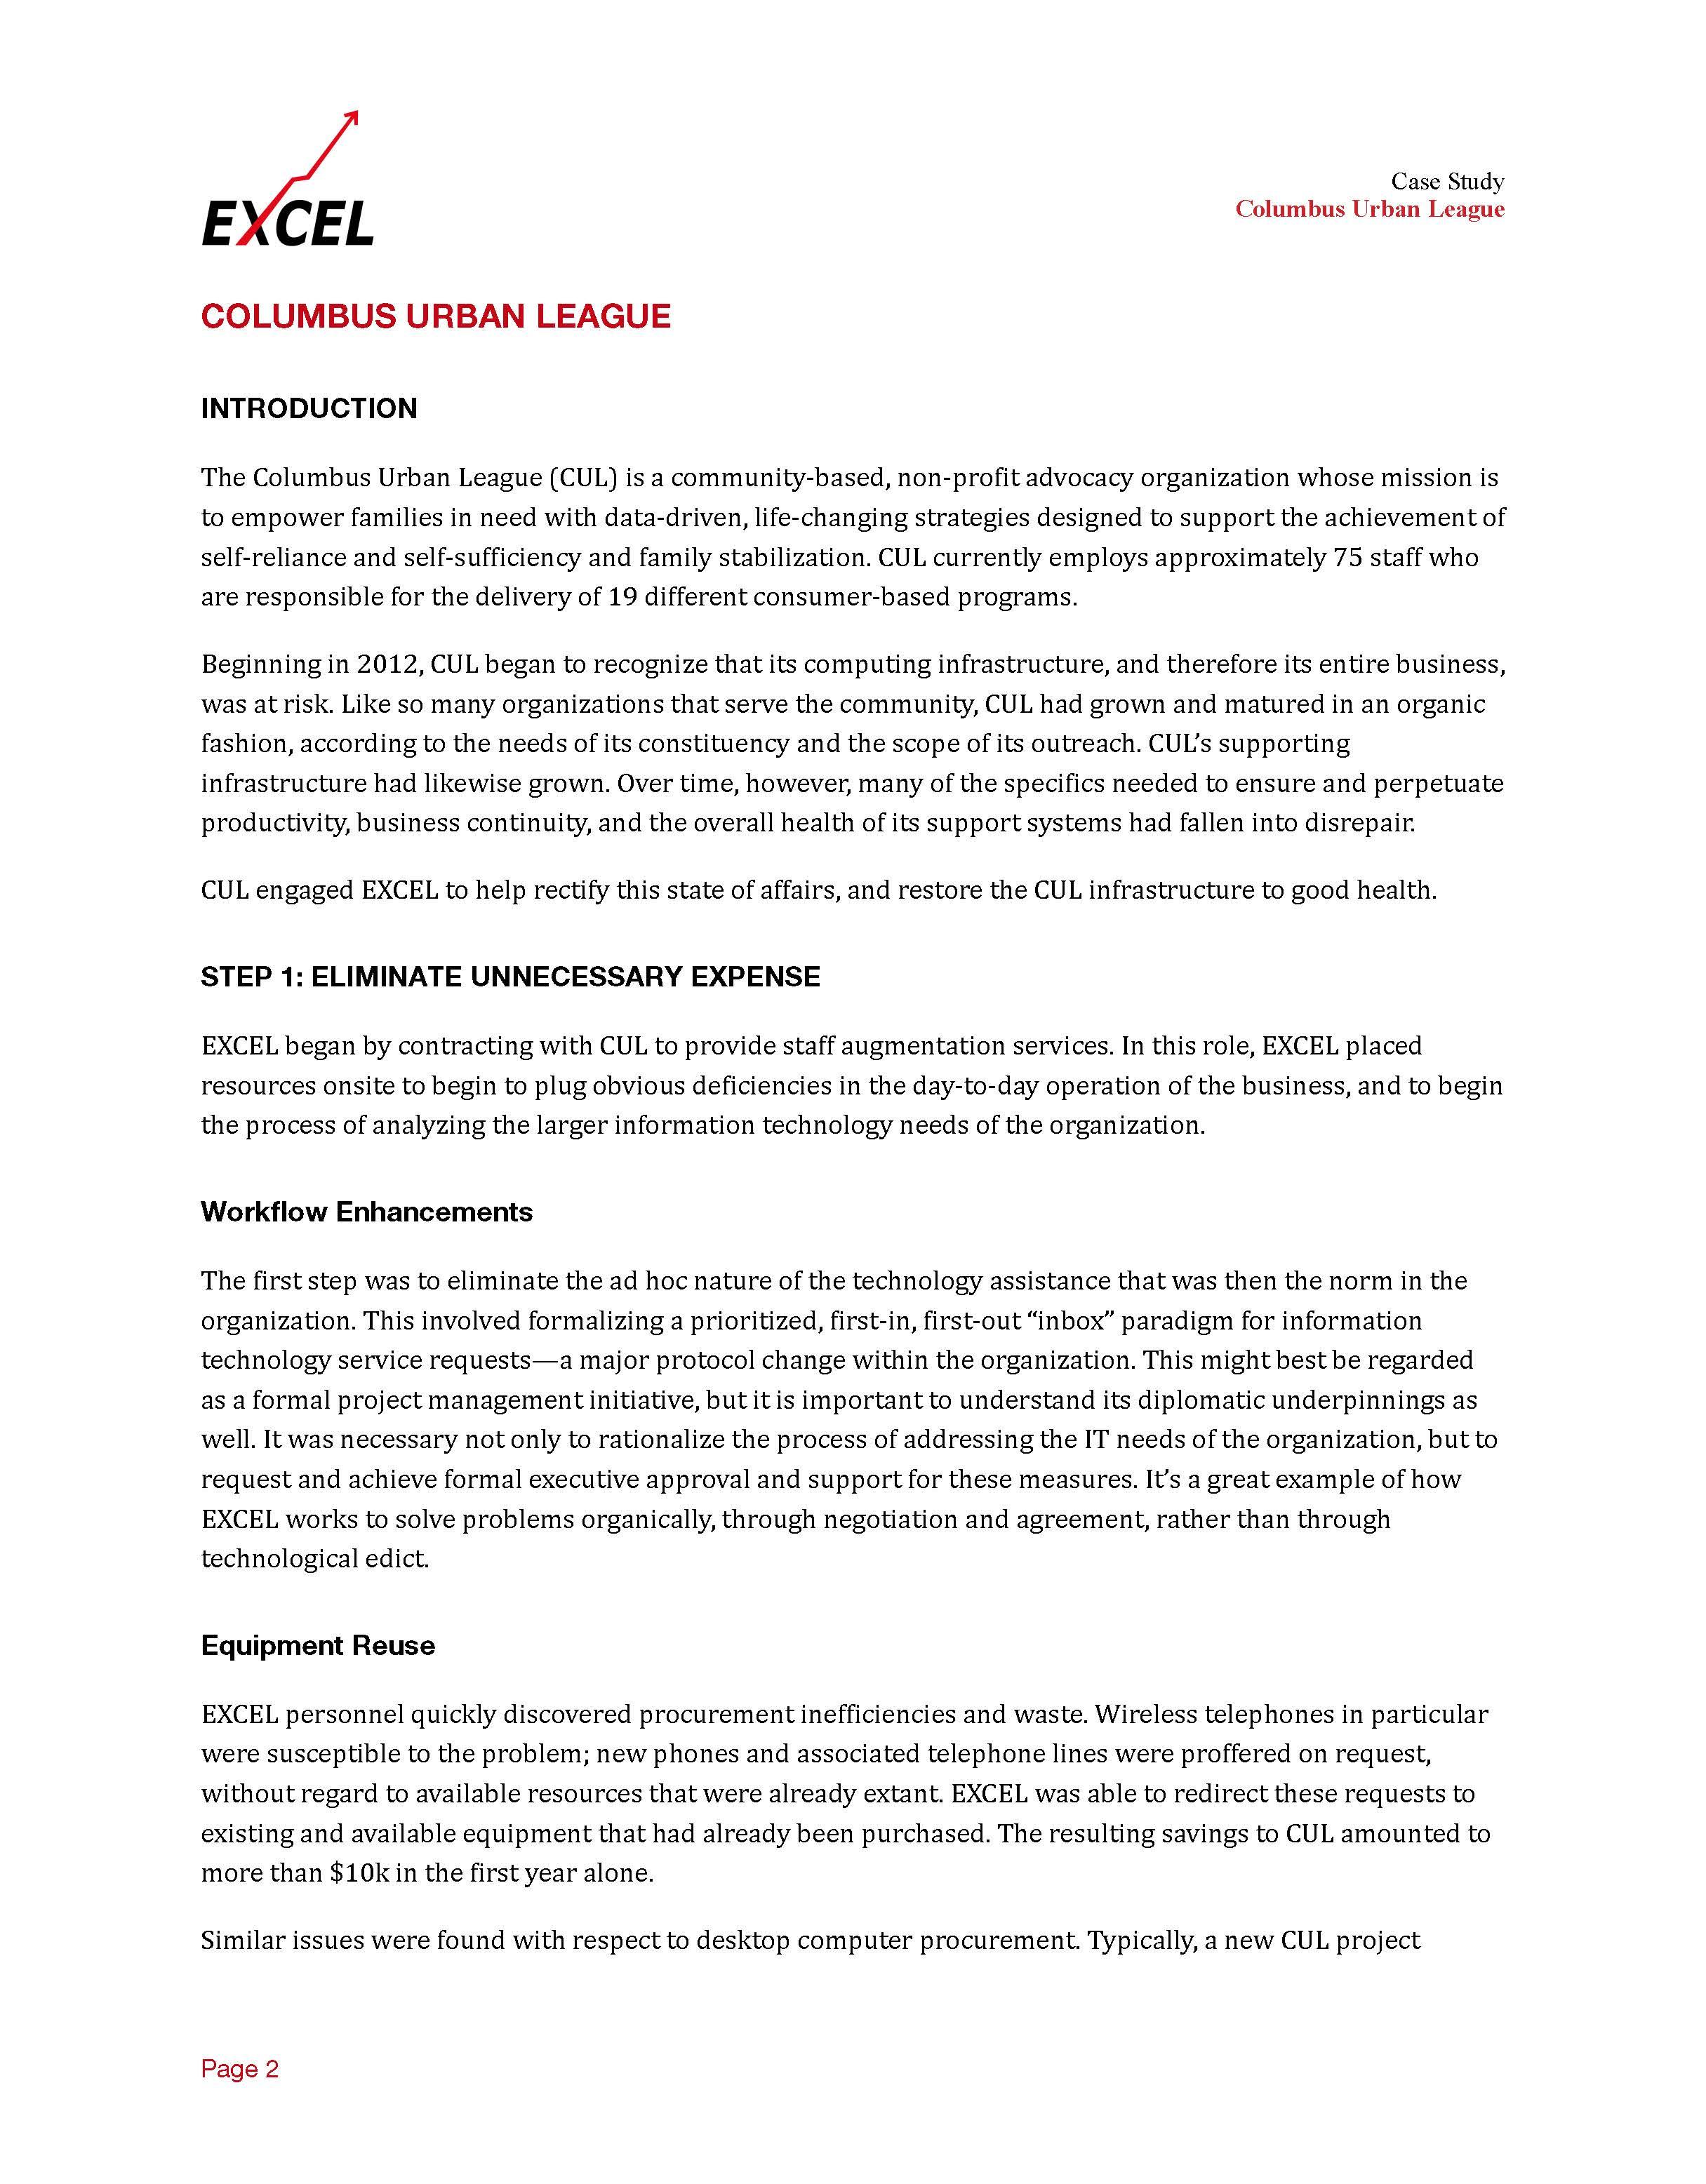 Case Study - CUL v3_Page_2.jpg